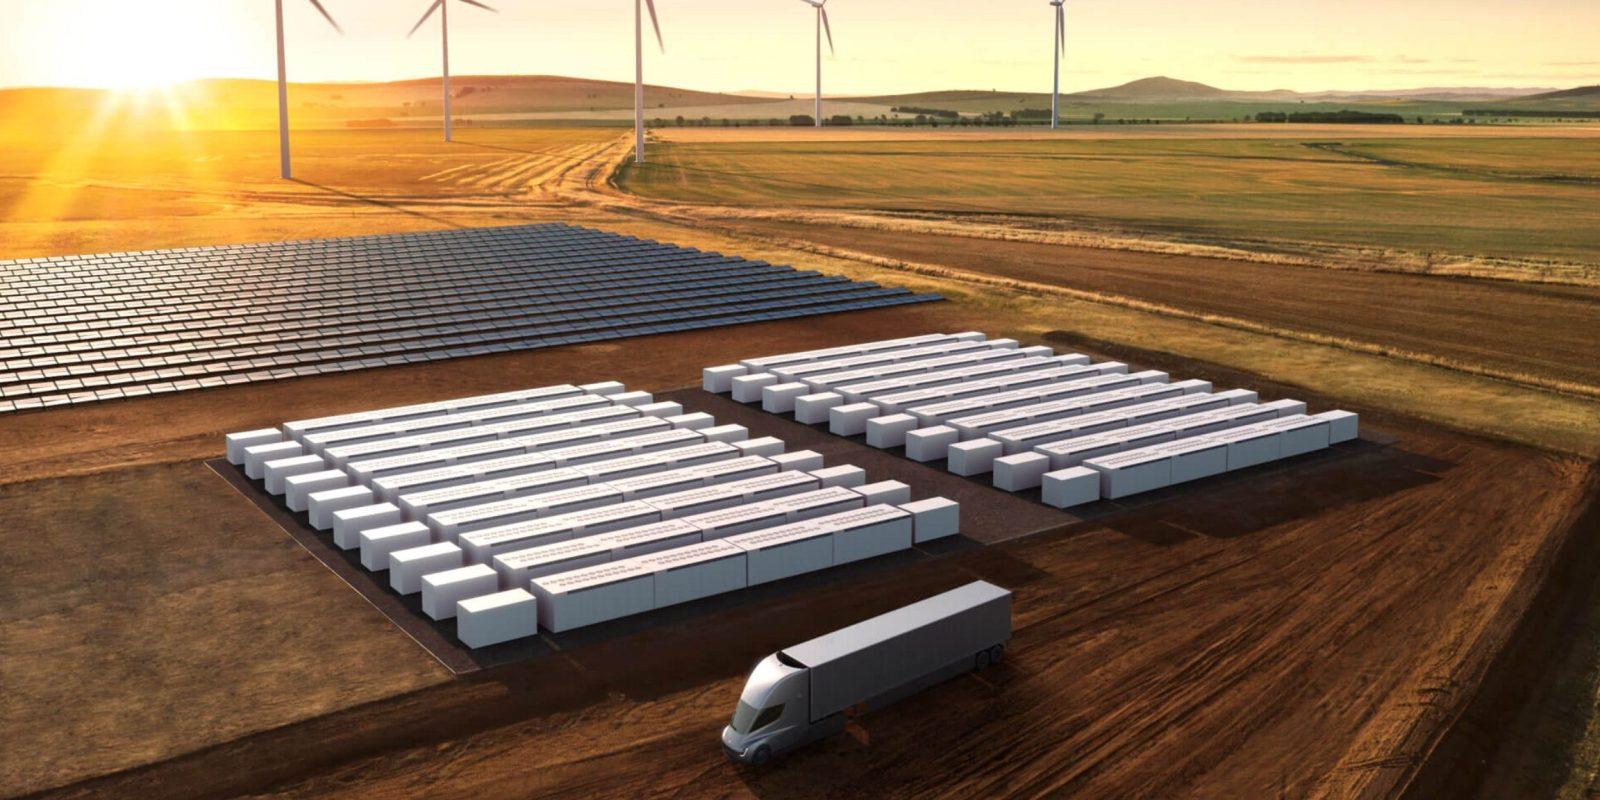 Elon Musk asks utilities to buy Tesla's new Megapack to replace peaker plants